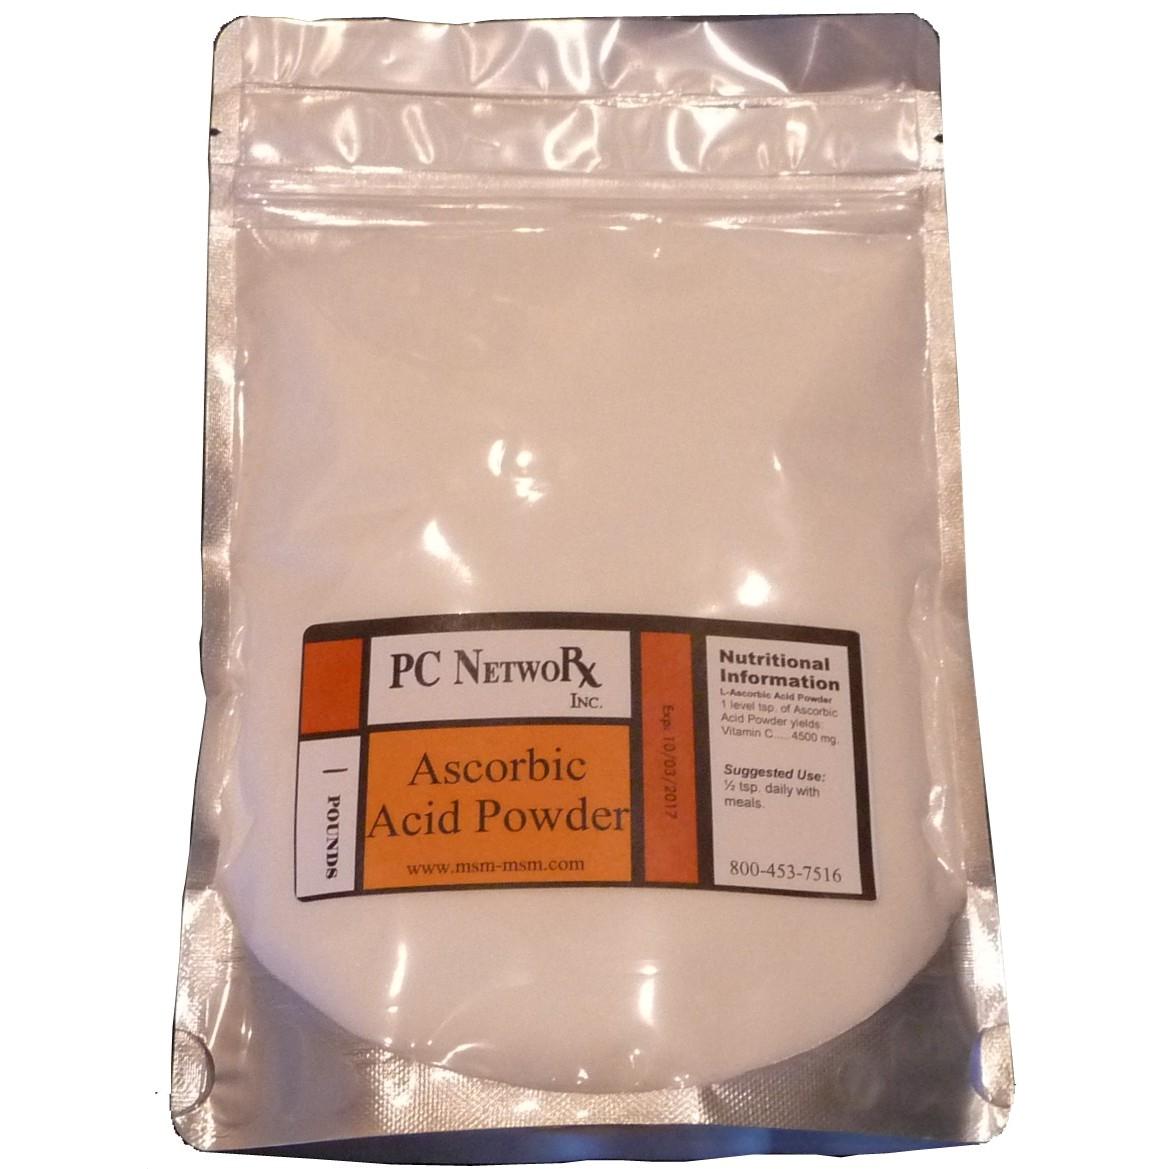 1 lb Bulk Ascorbic Acid Powder